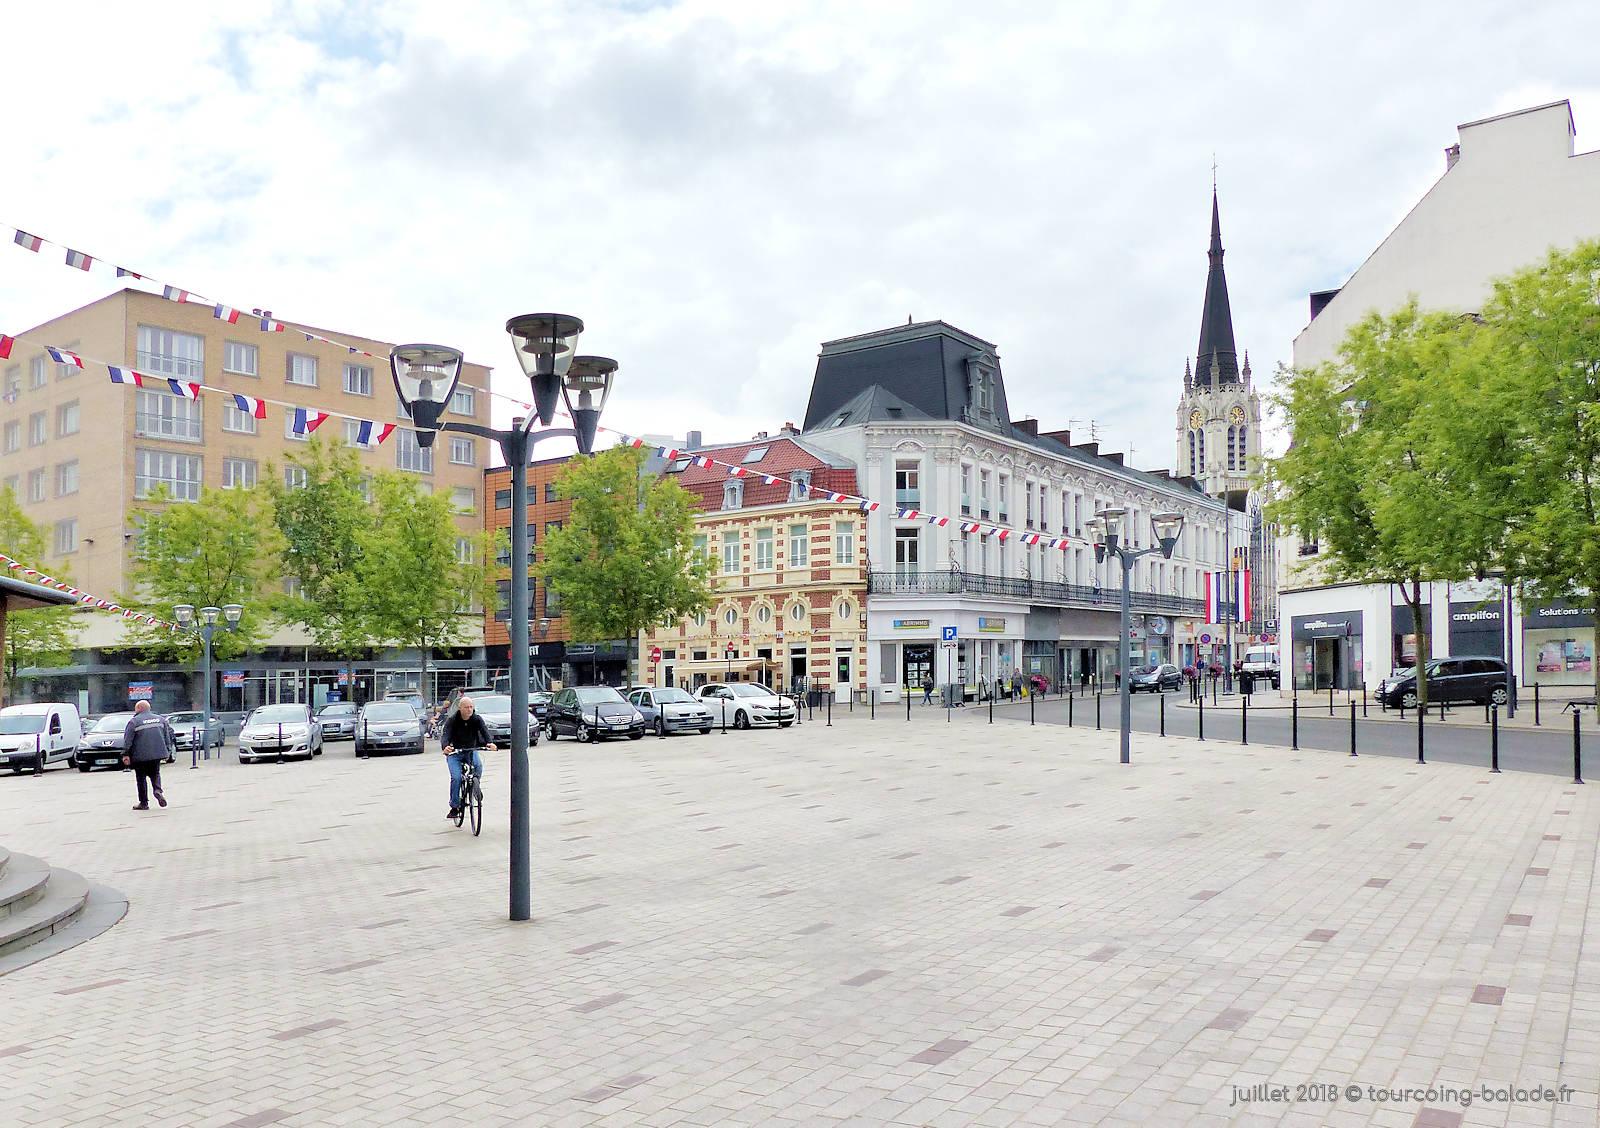 Bar La Petite Industrie - Place Hassebroucq, Tourcoing.